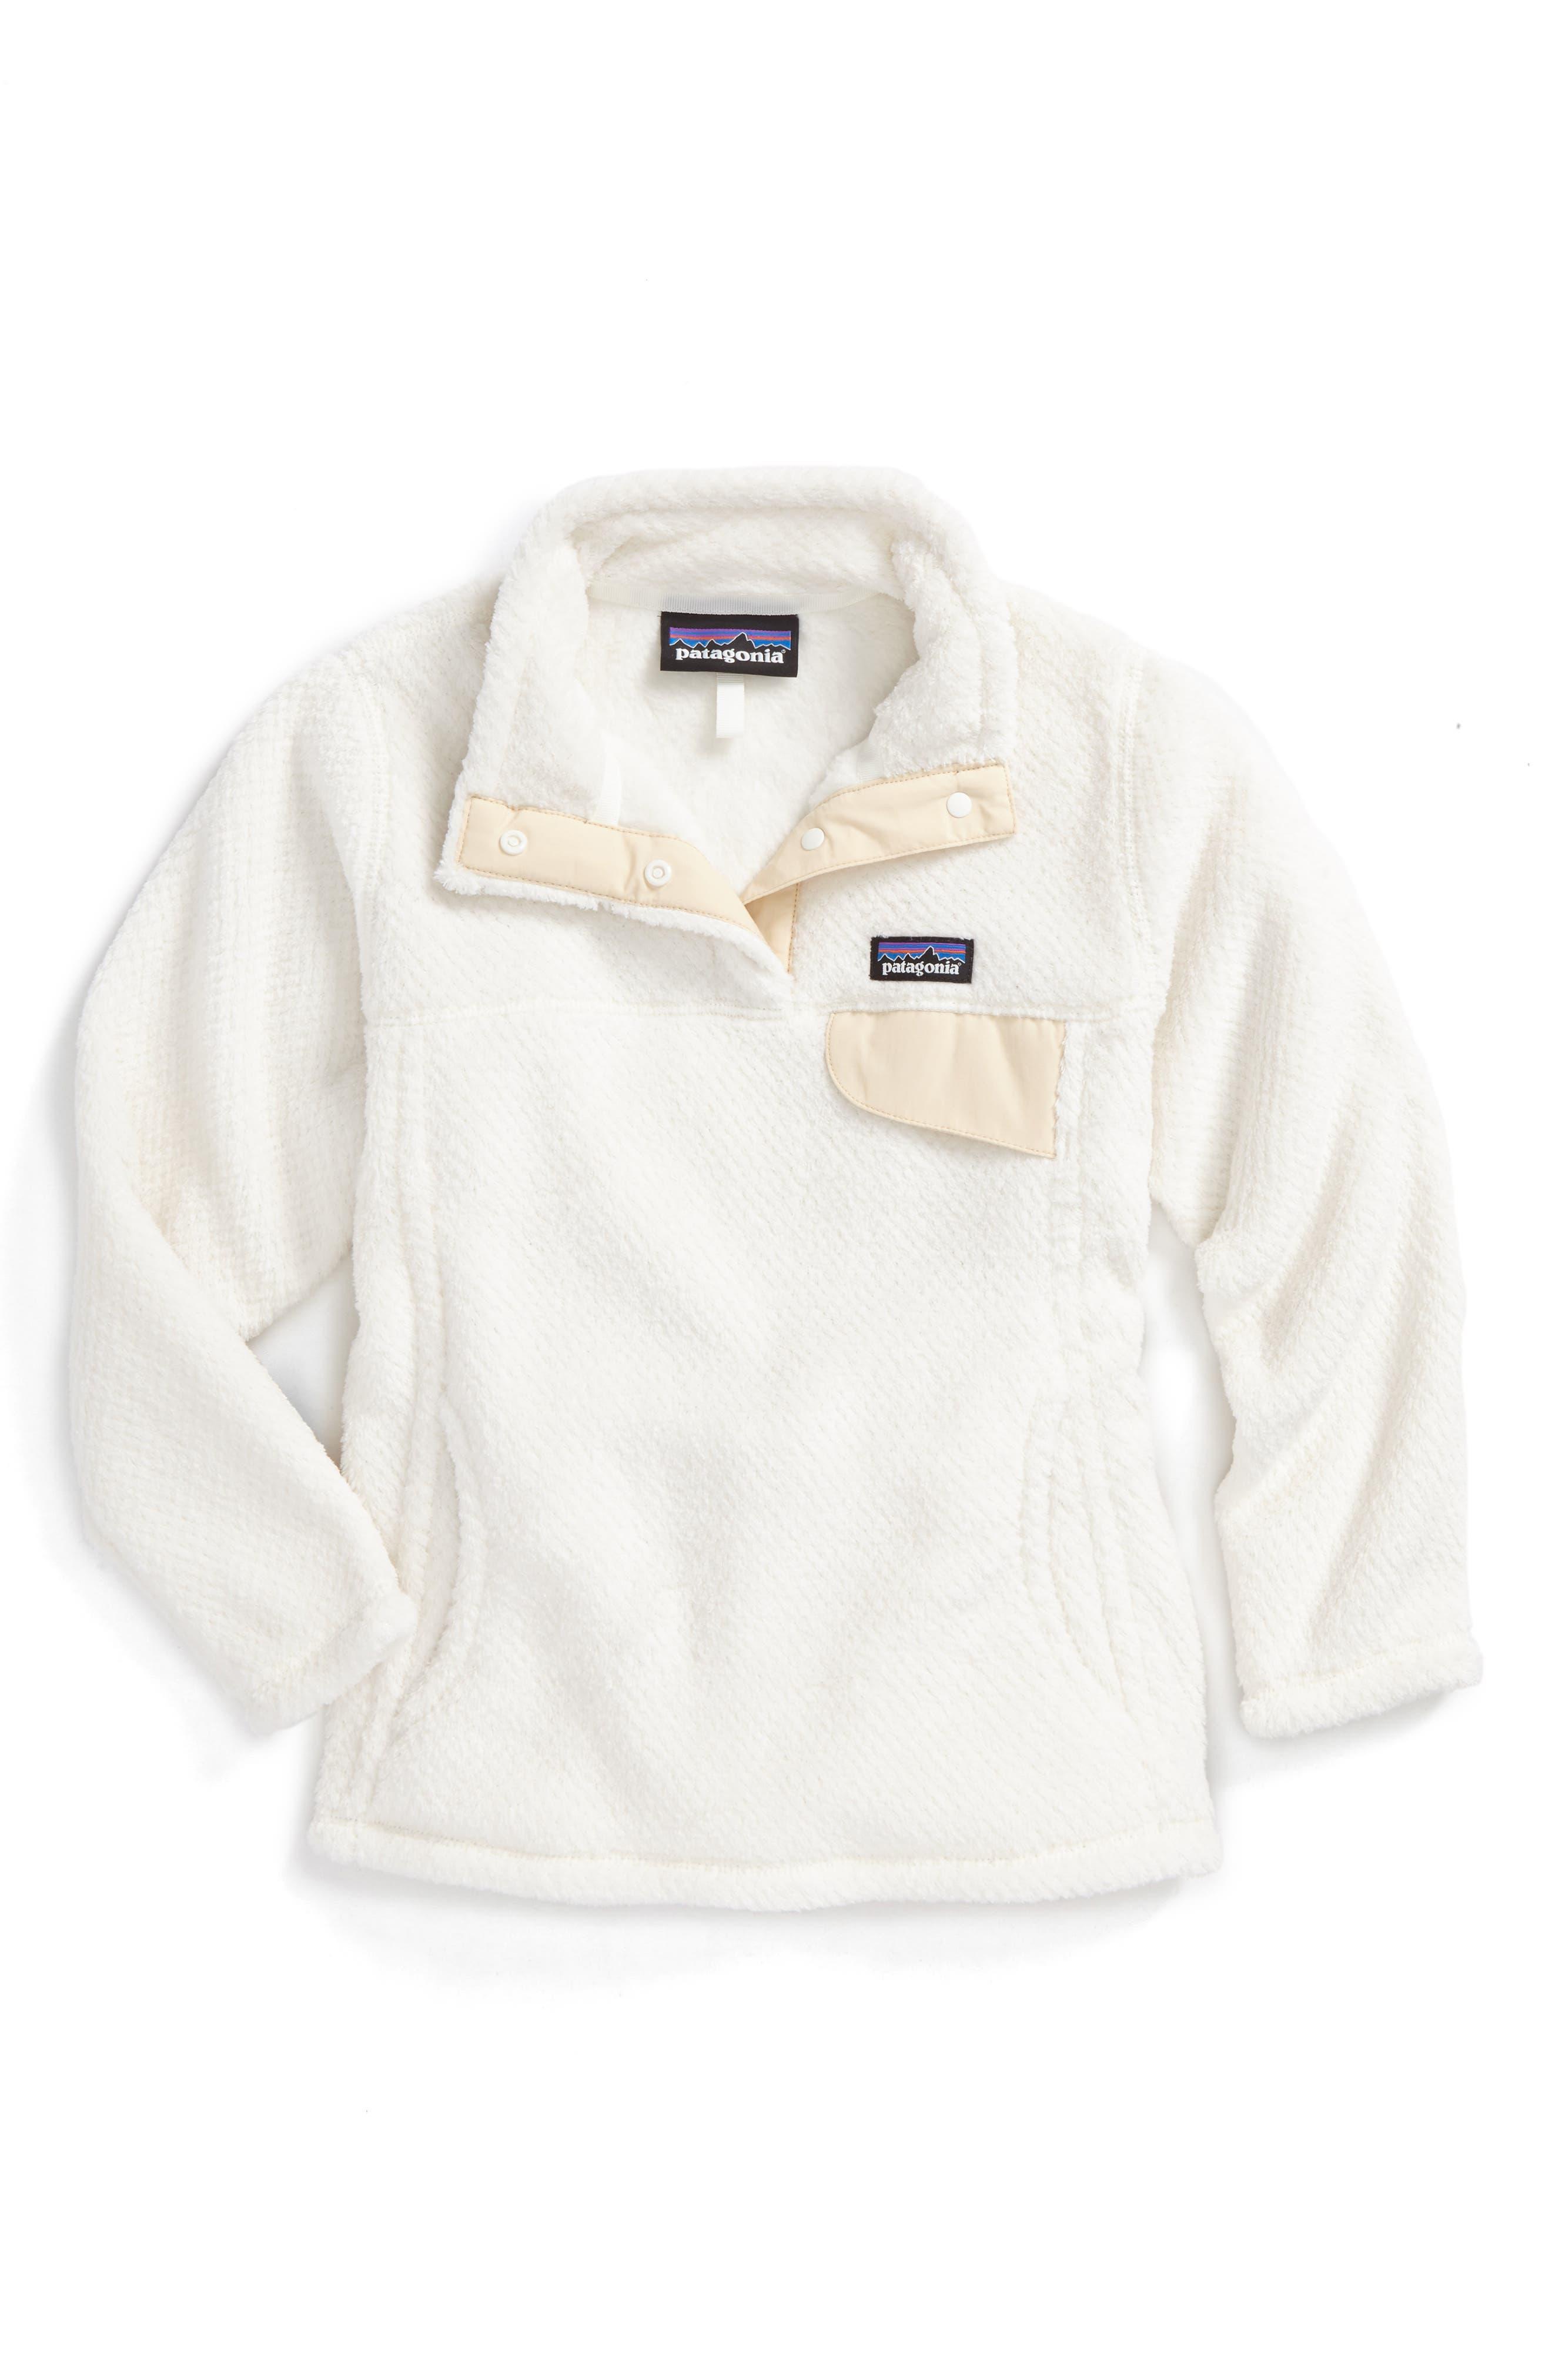 Girls Patagonia ReTool SnapT Pullover Size XXL (1618)  White